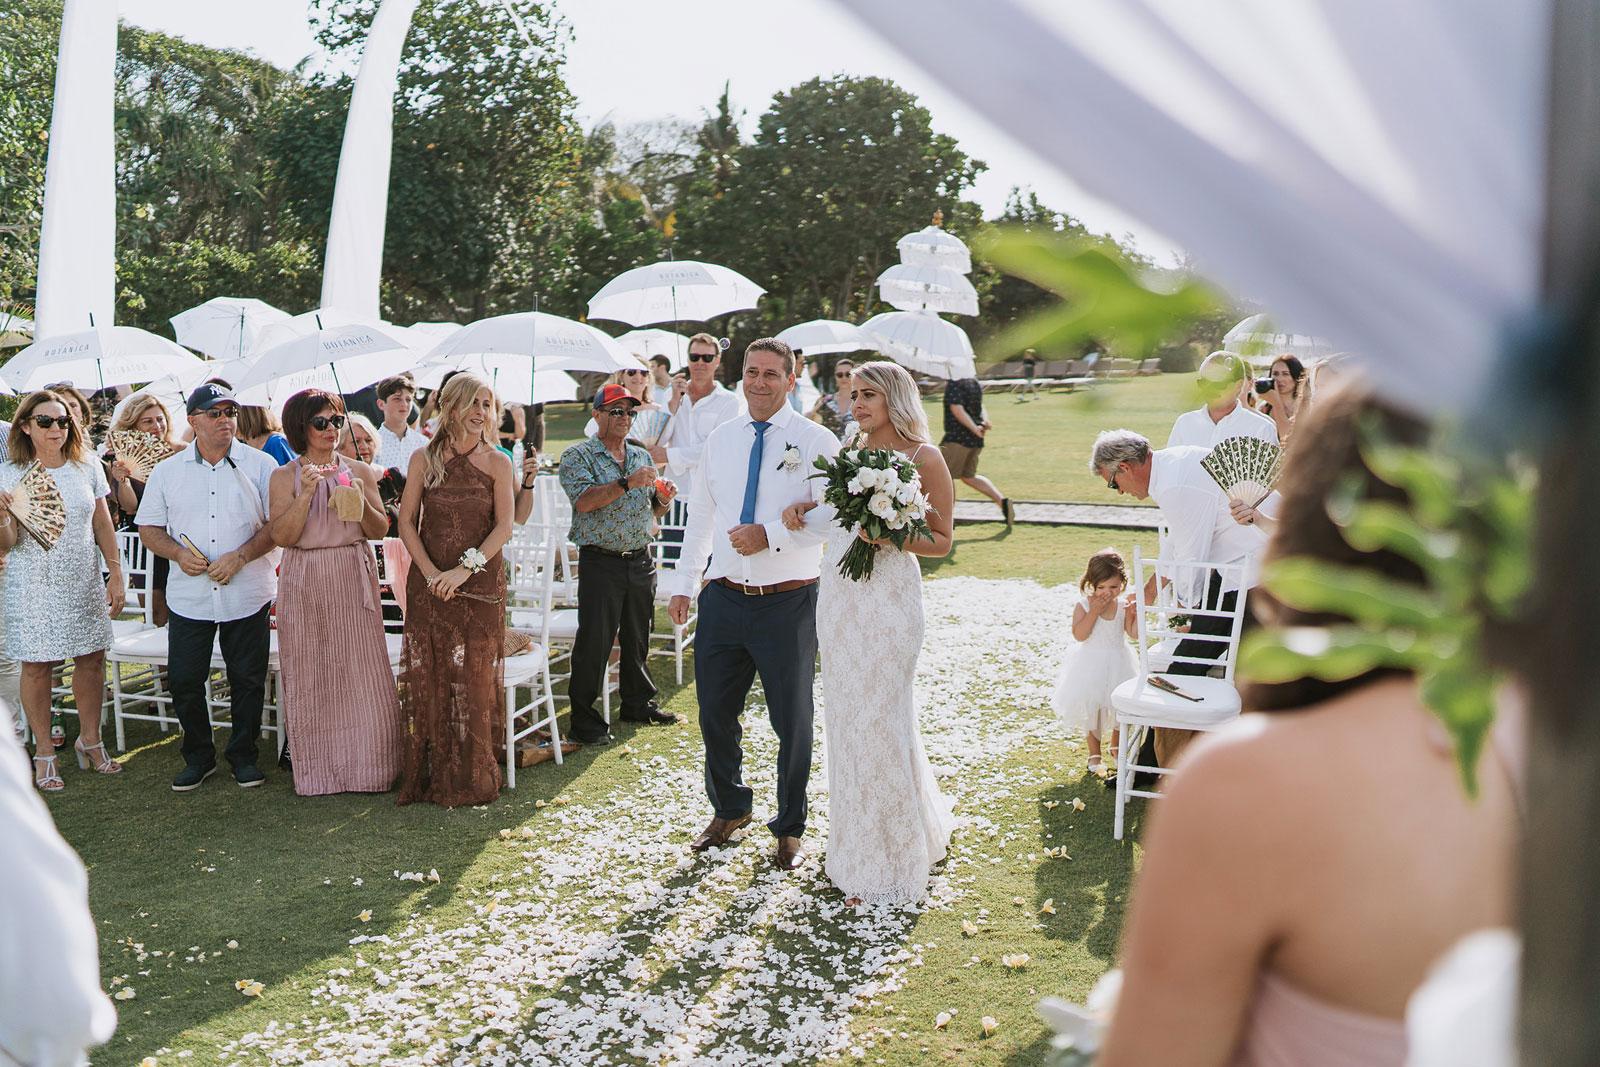 newfound-j-j-bali-nusa-dua-wedding-wedding-photographer-043-a